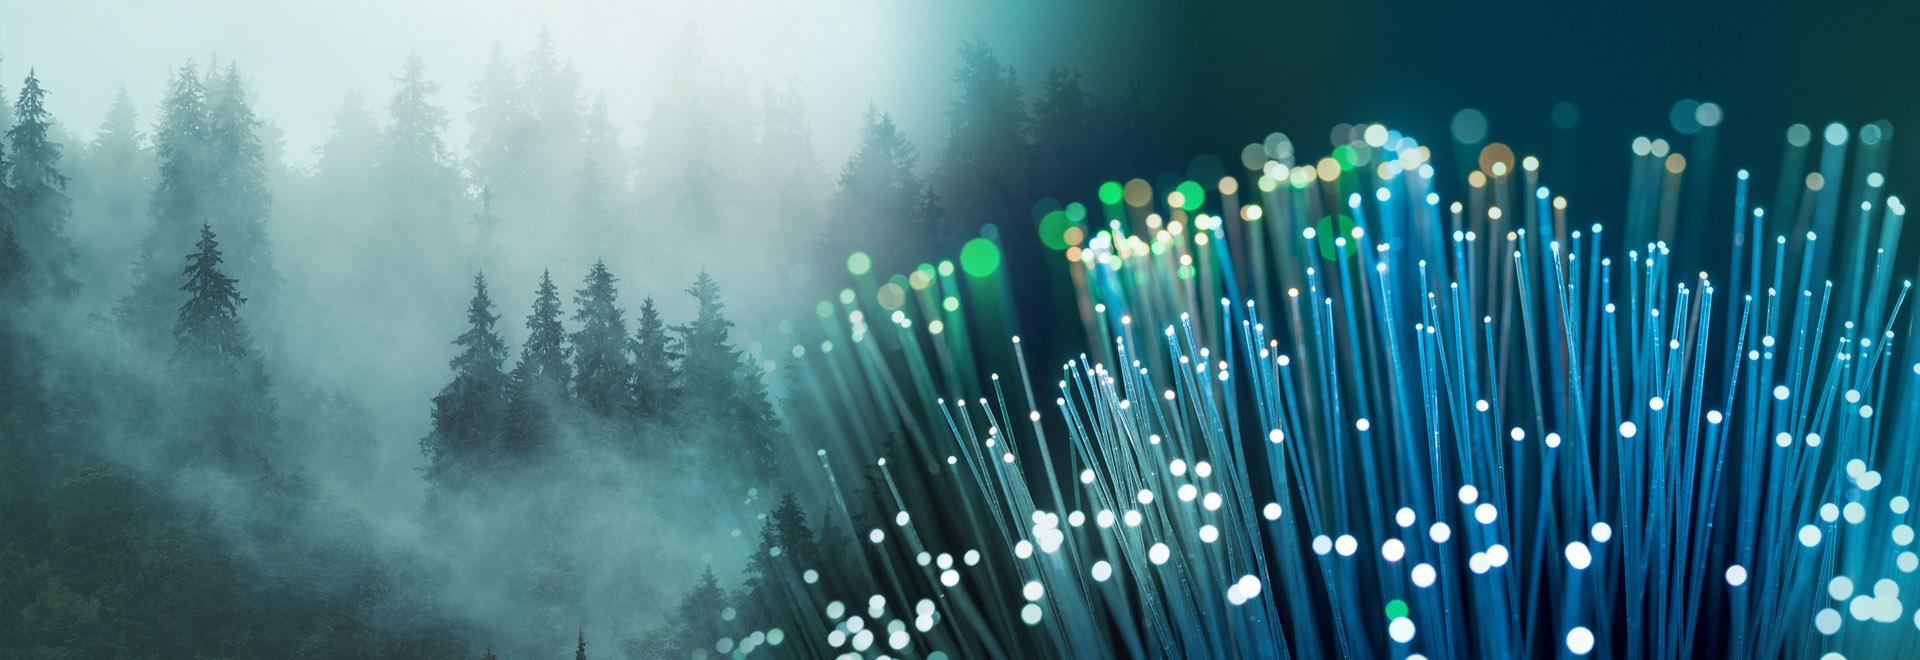 tranås energi fiber